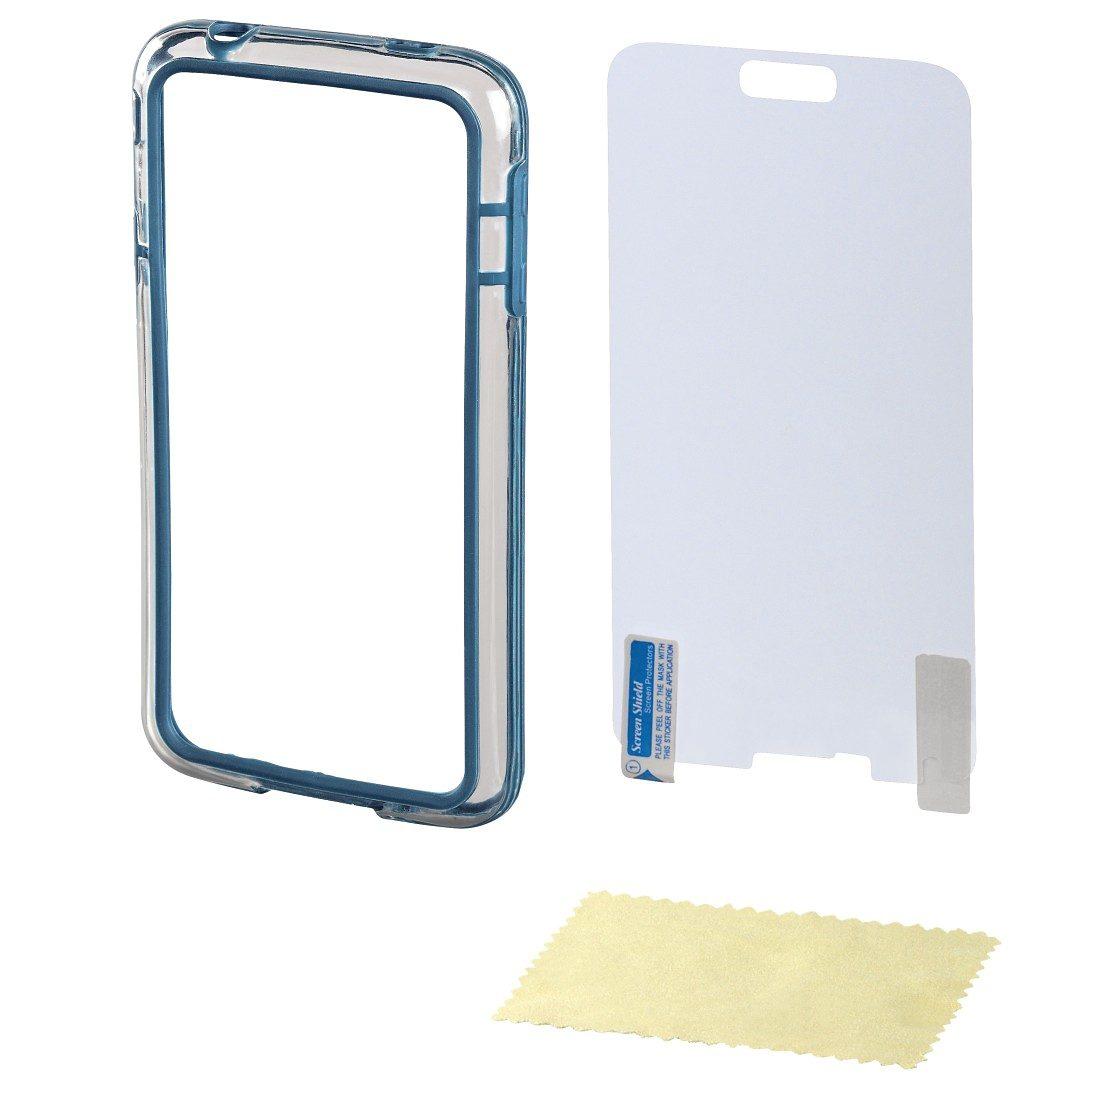 Hama Cover Edge Protector für Samsung Galaxy S5 (Neo) +